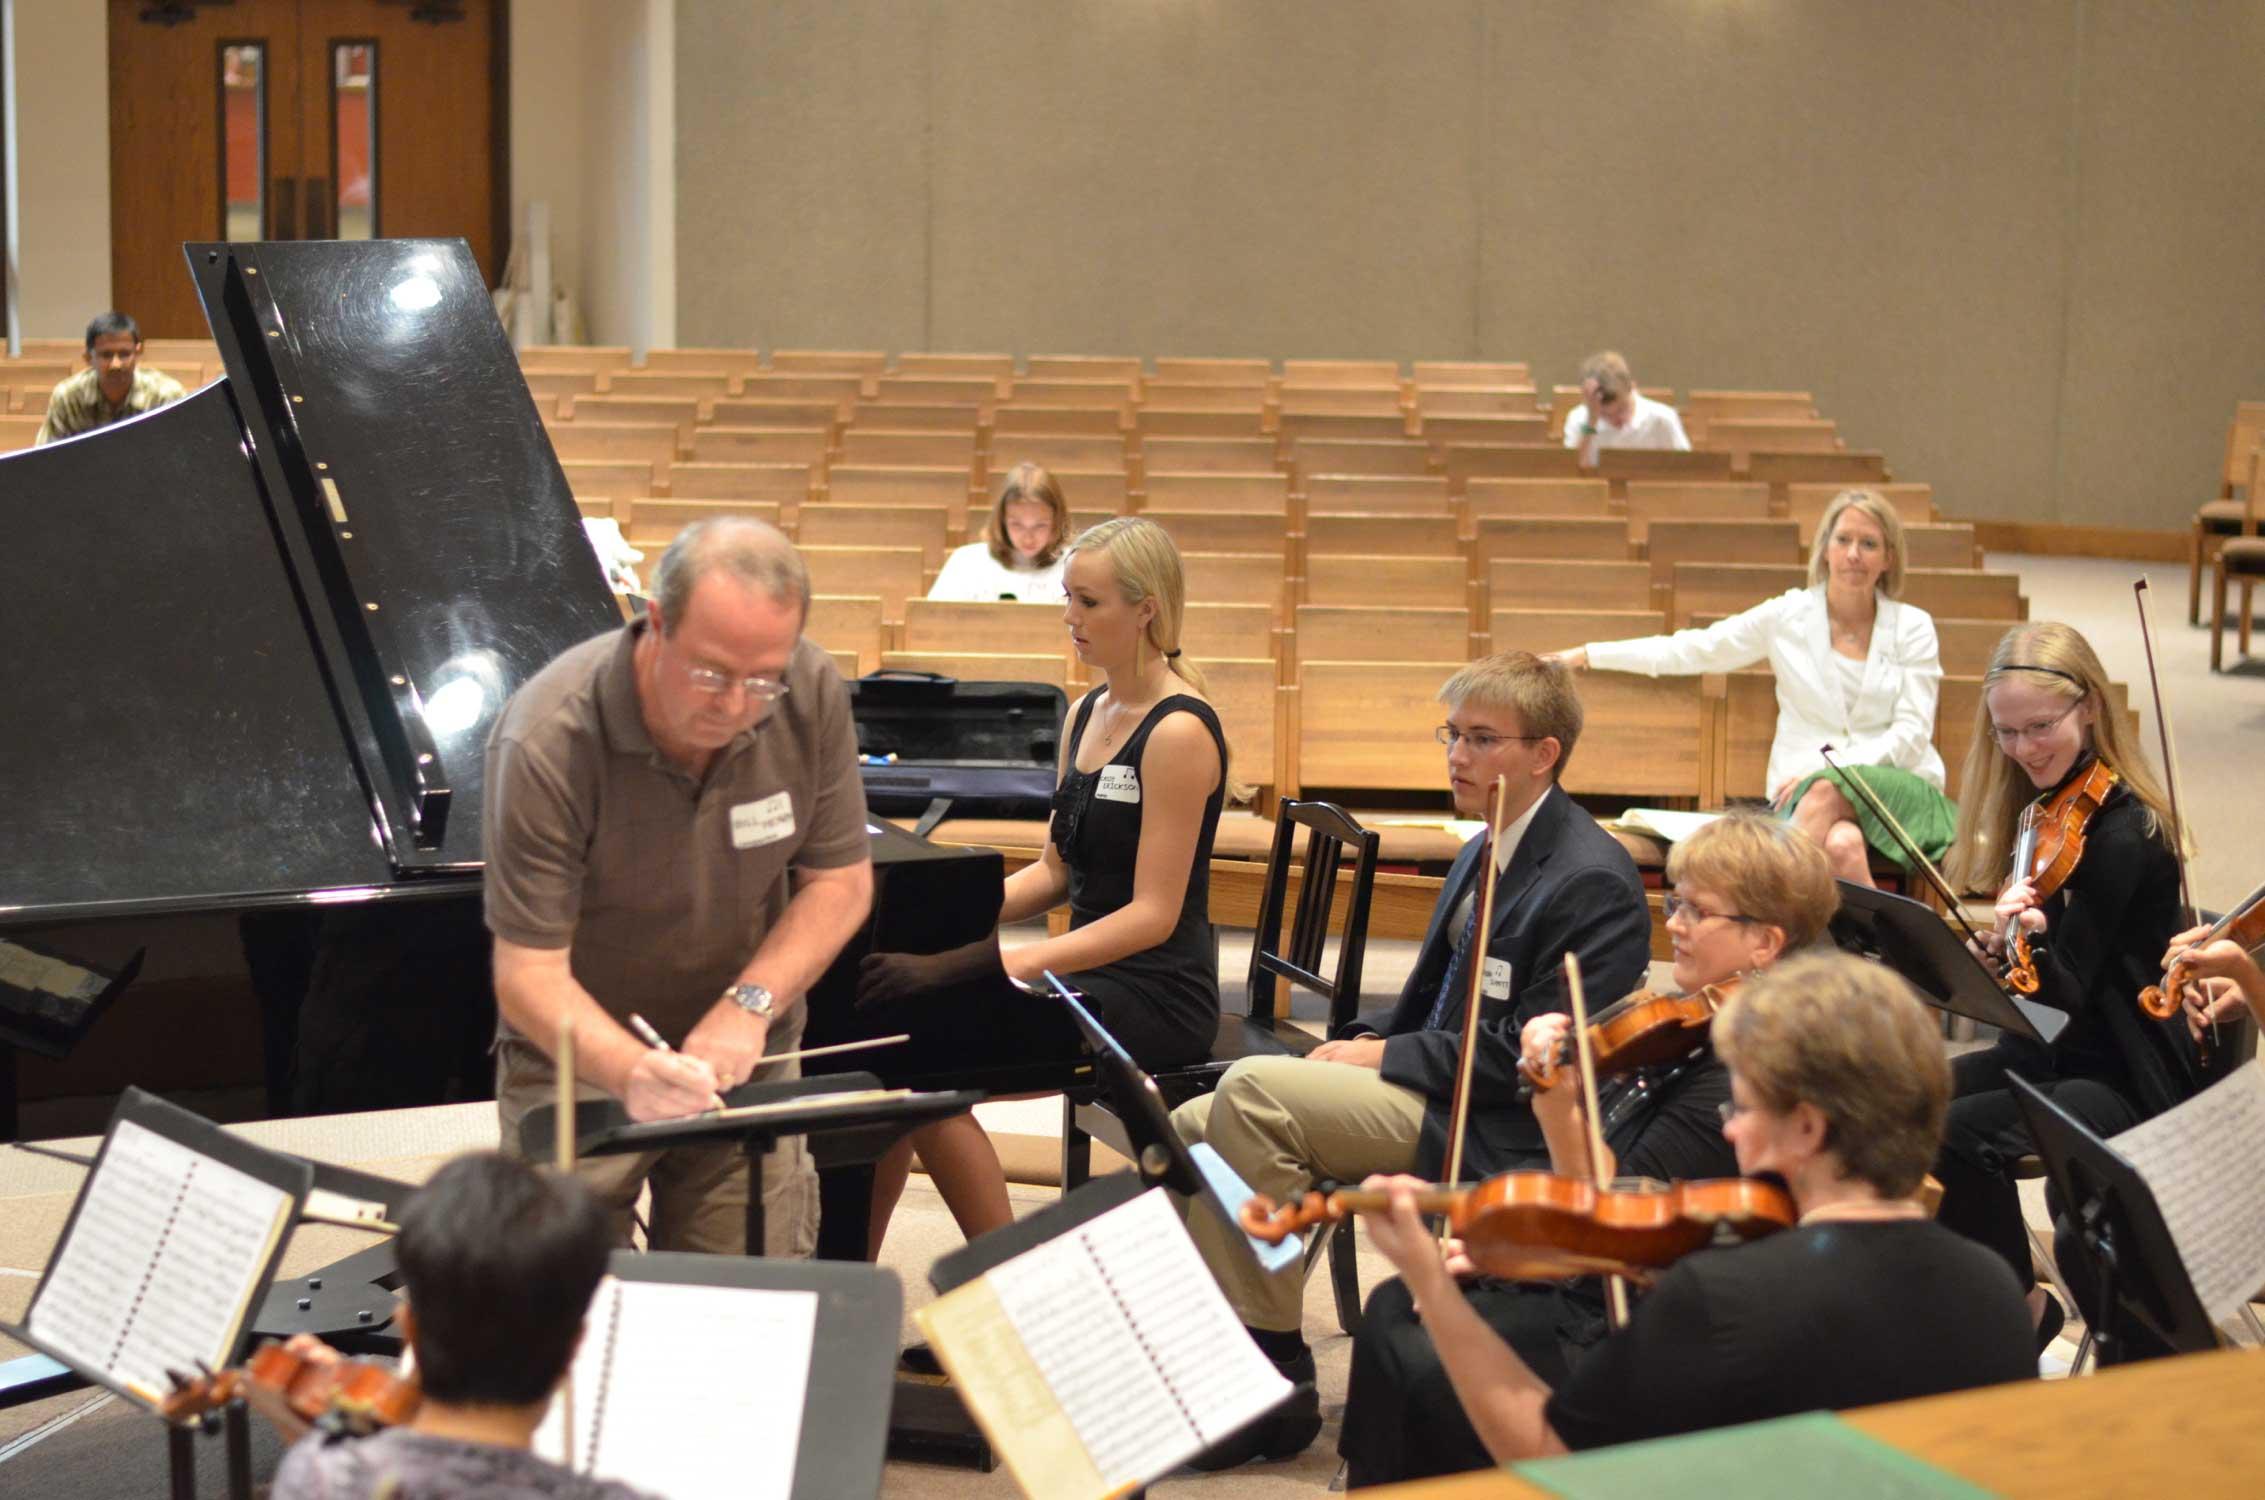 Cassy-at-Concerto-Event.jpg